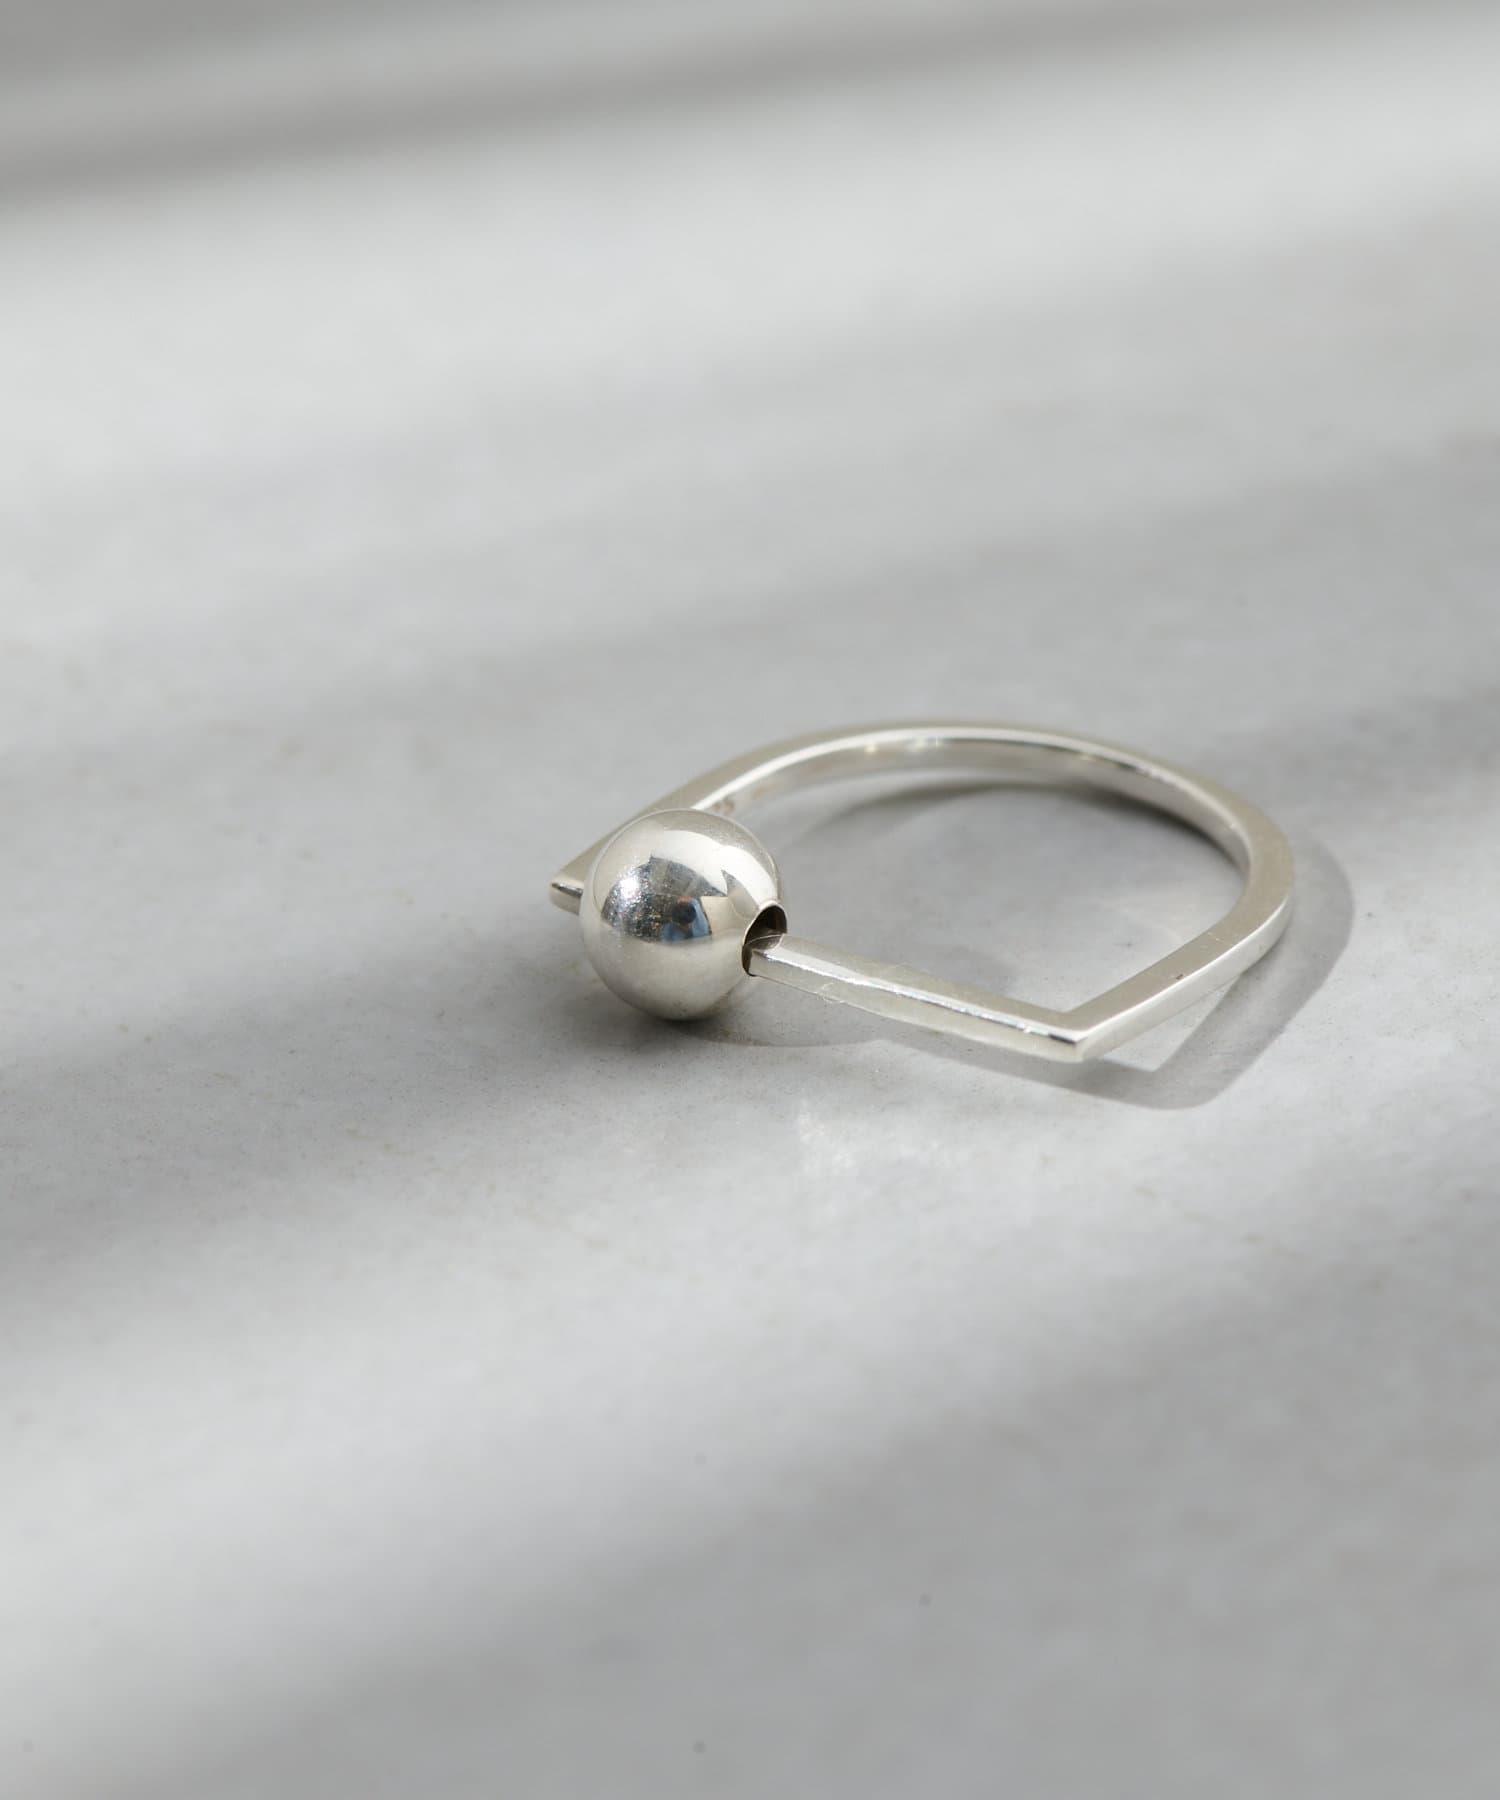 Discoat(ディスコート) AZ ball bar ring